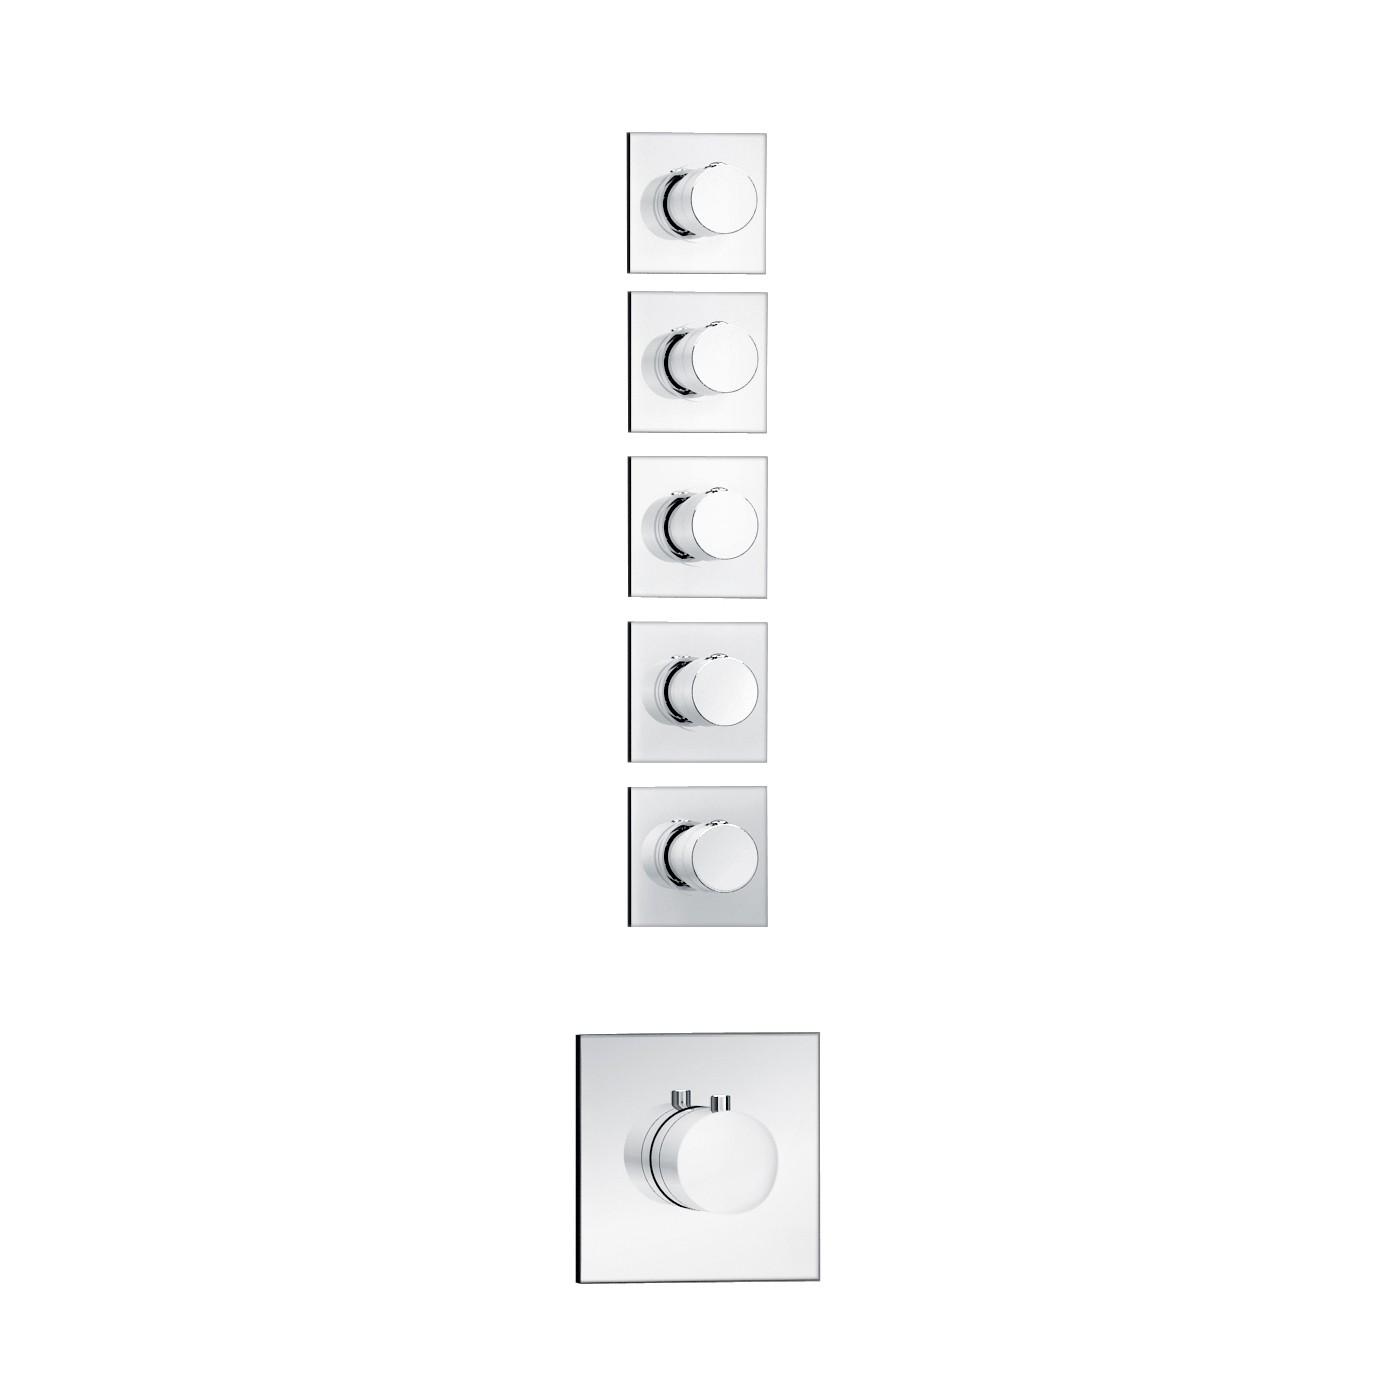 Soho 5 Wege Unterputz Thermostat Armatur